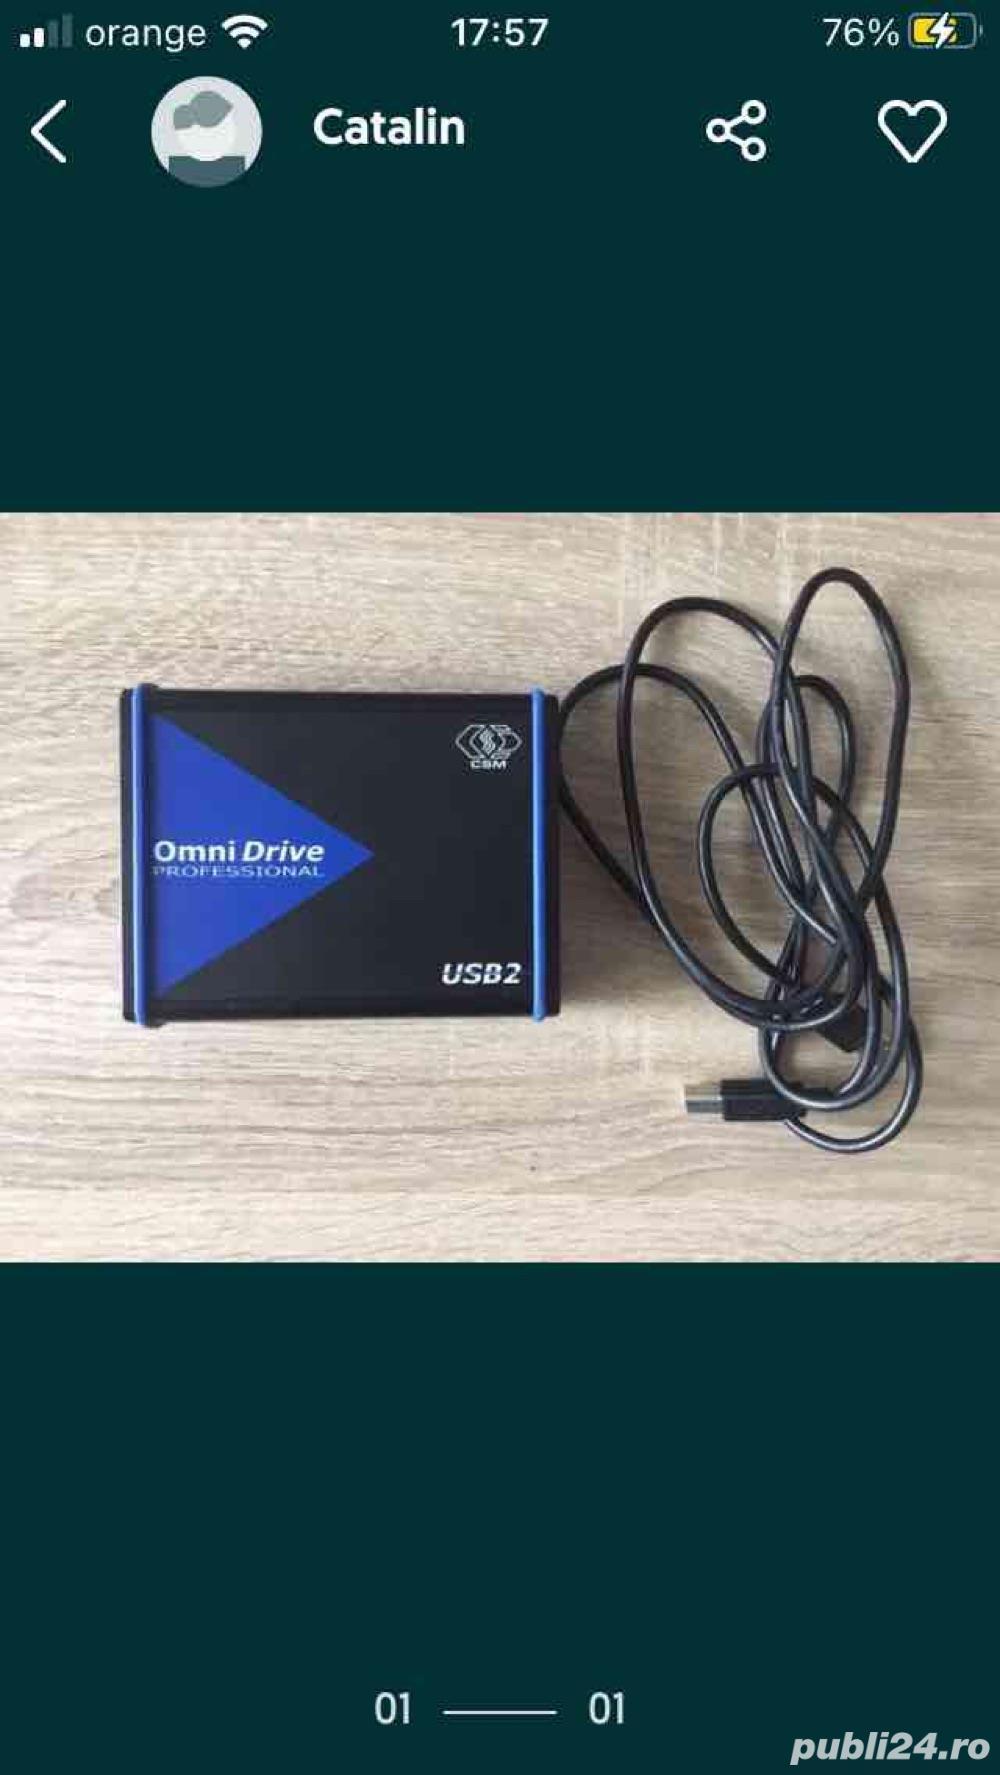 OmniDrive usb 2.0